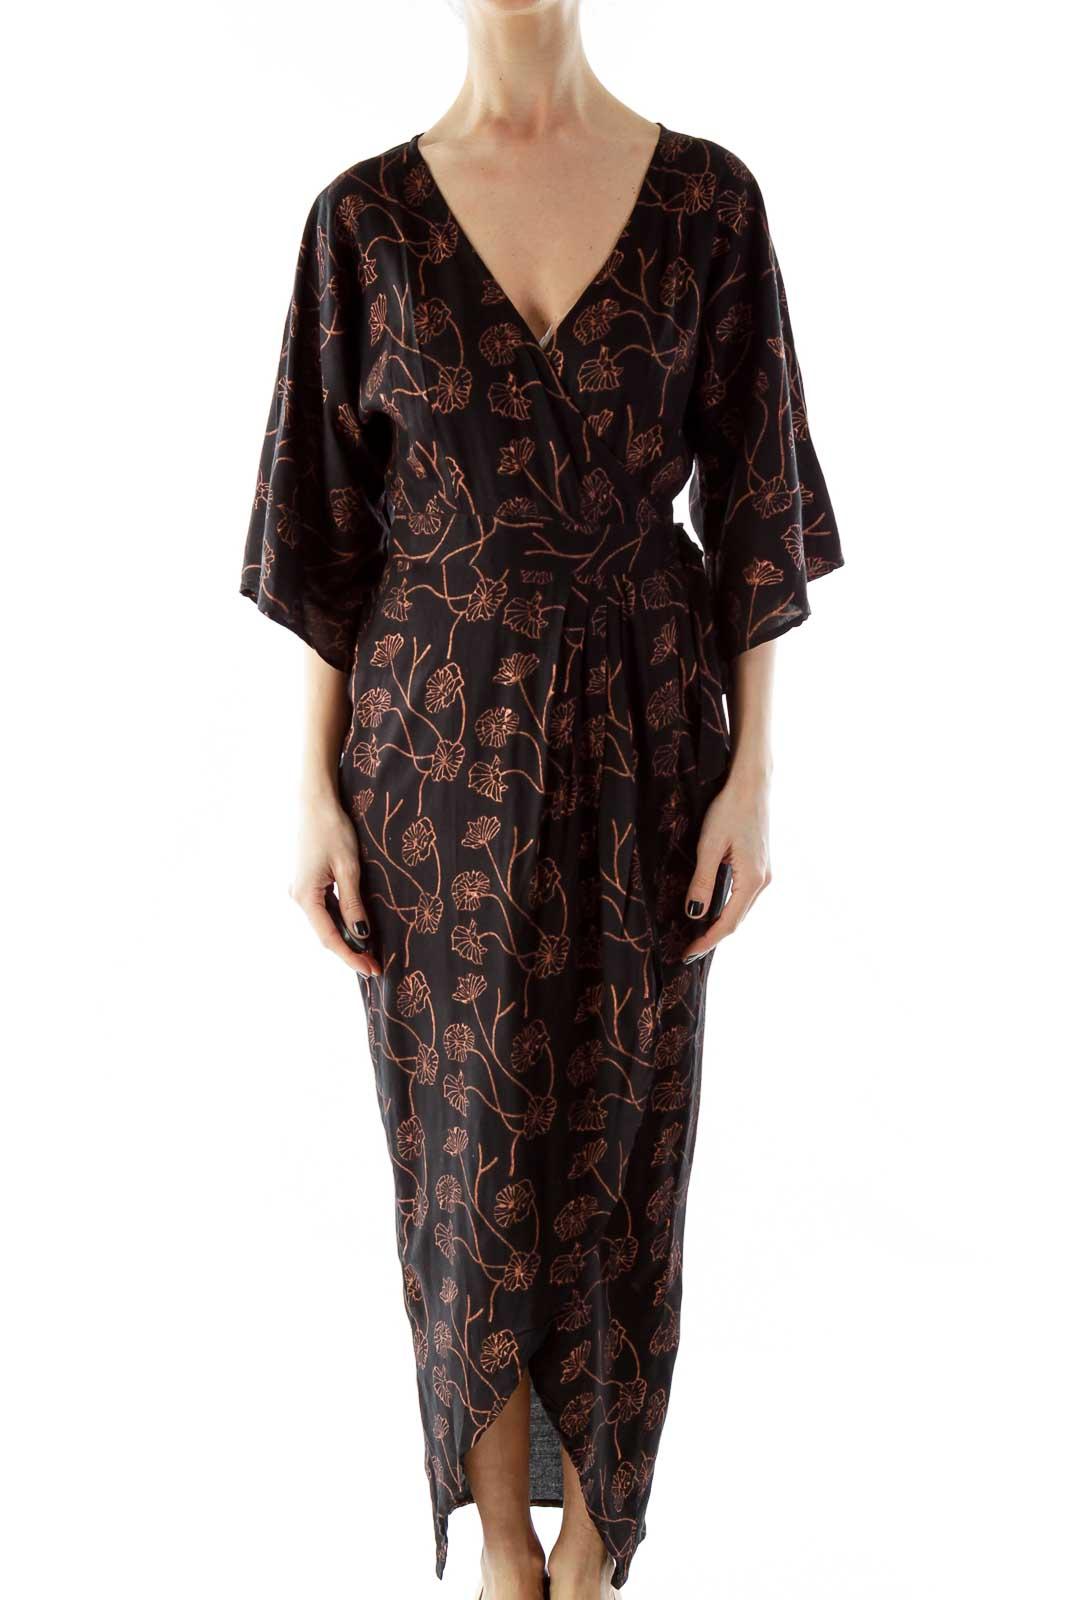 Copper Flower Print Kimono Maxi Wrap Dress Front